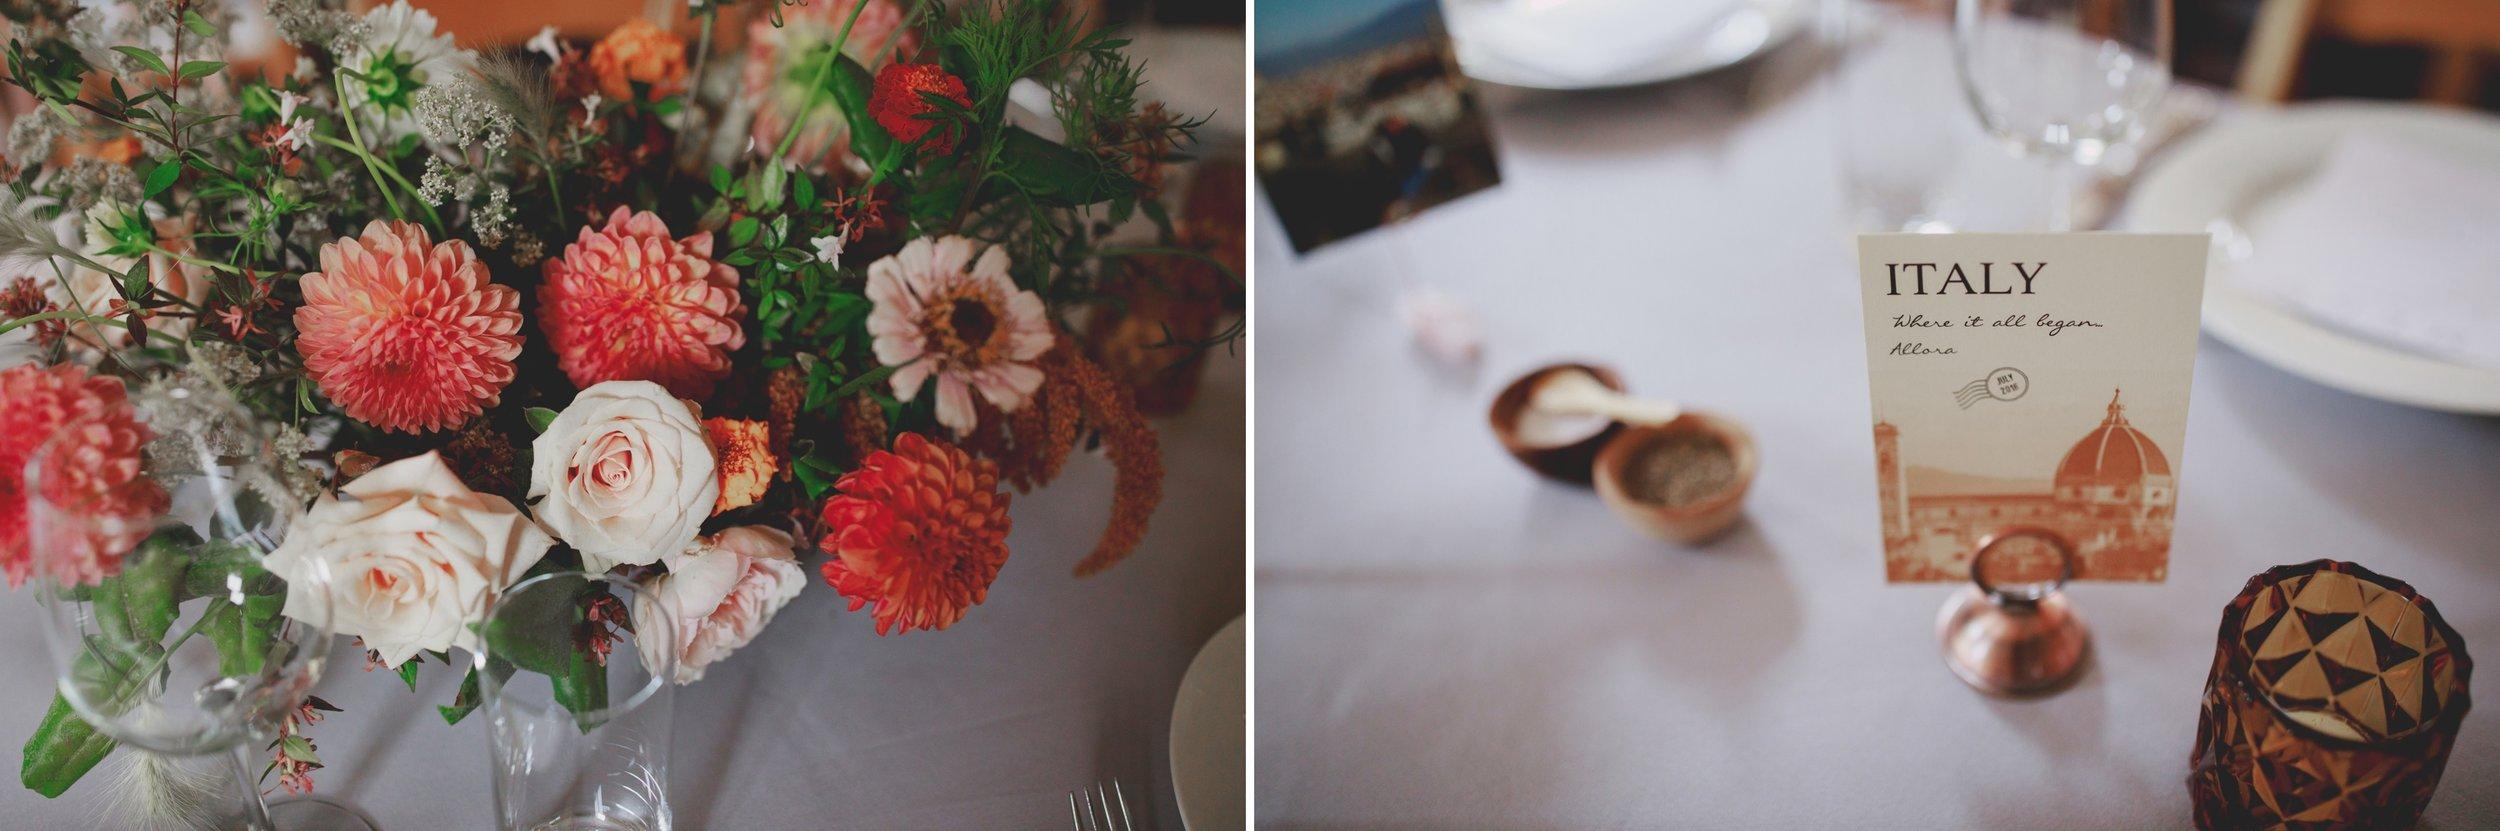 amandavanvels_headlands_center_wedding_san_francisco_077.jpg